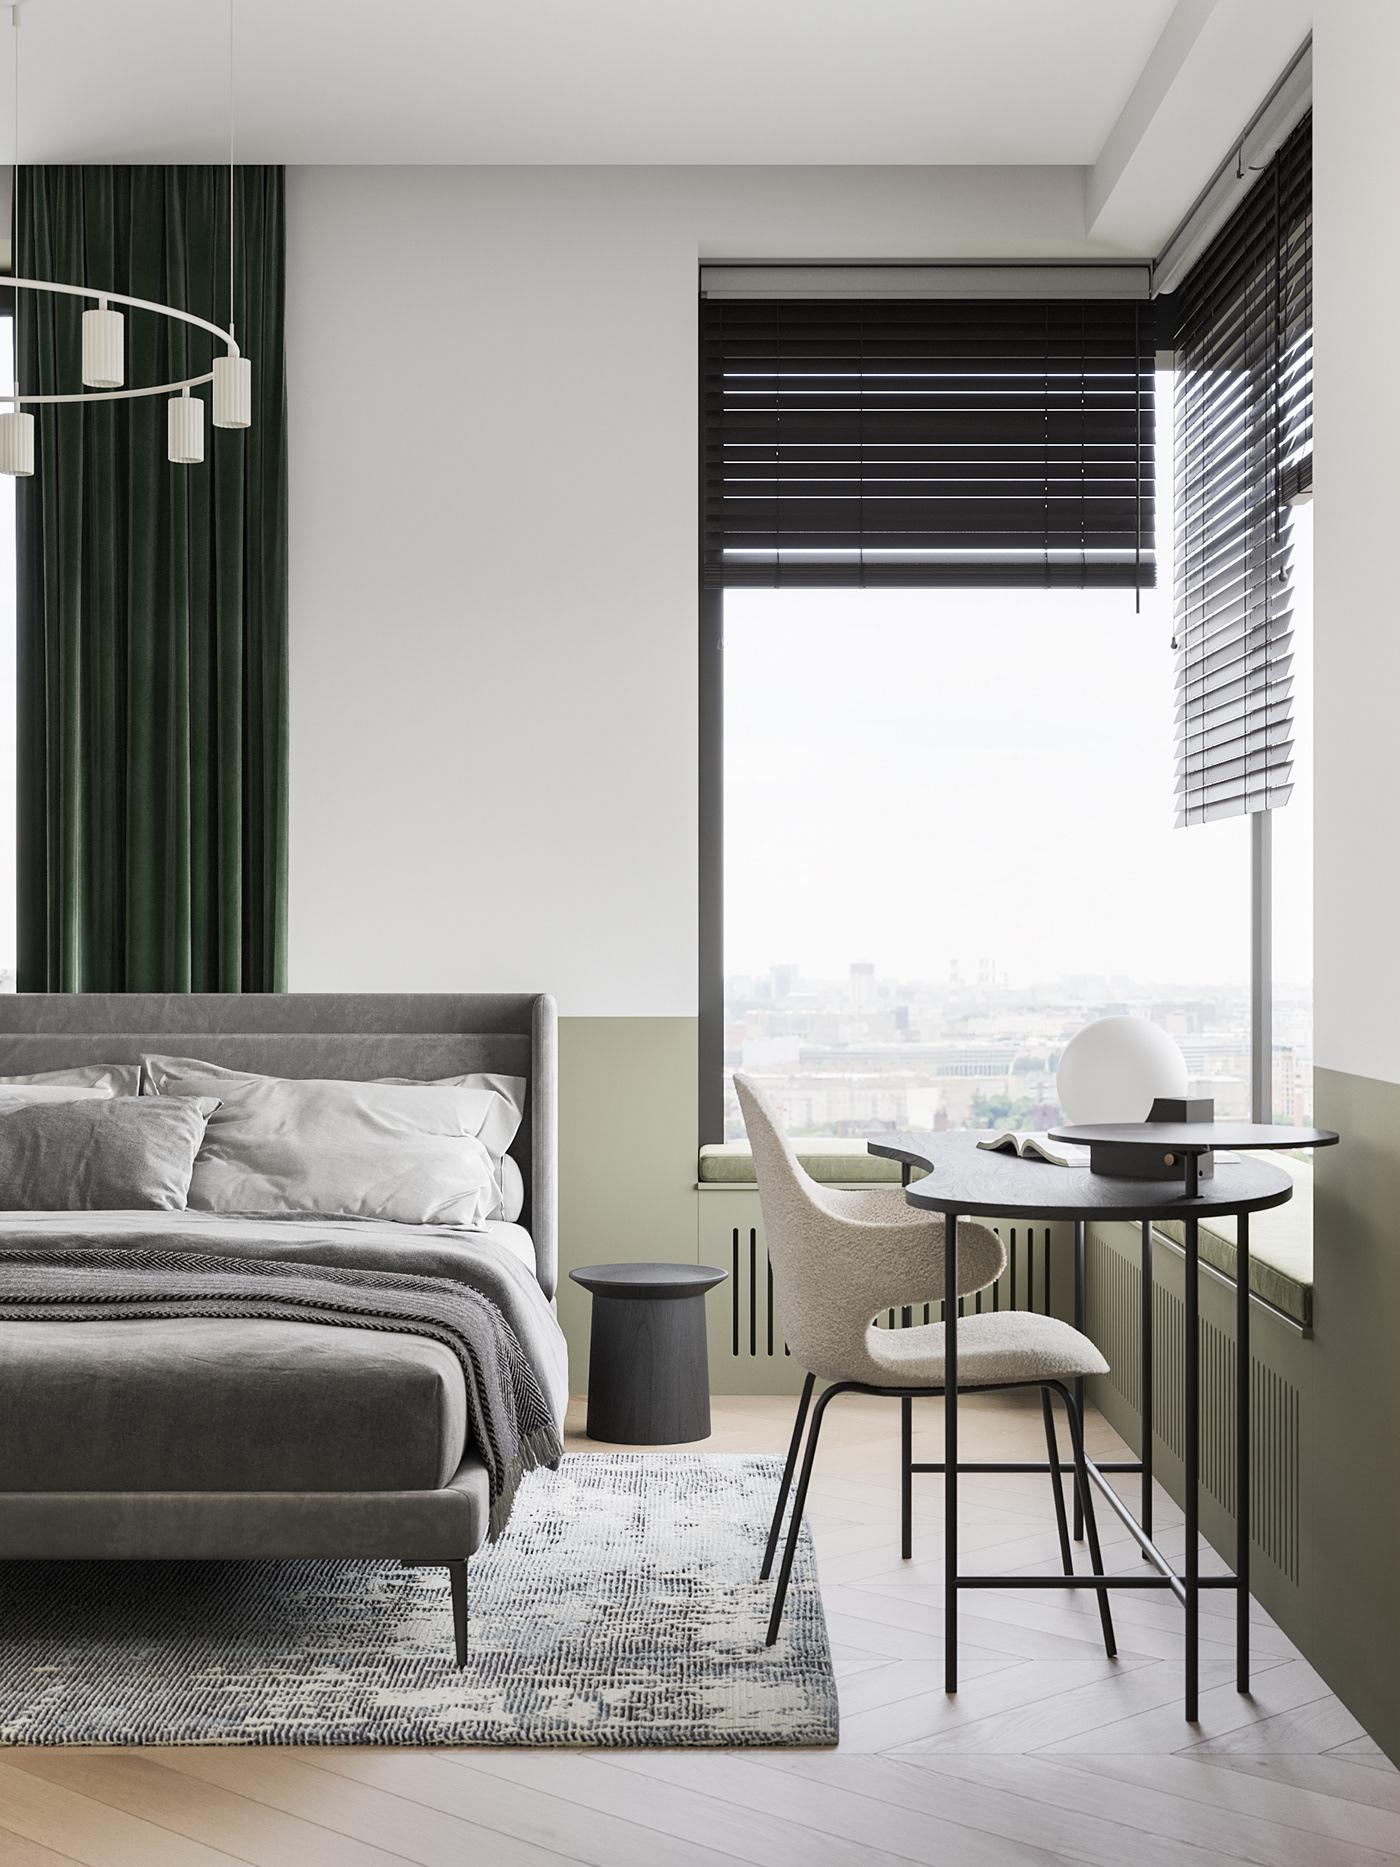 3ds max bedroom corona designinterior designinteriors Interior interior design  livingroom Scandinavian design visualization